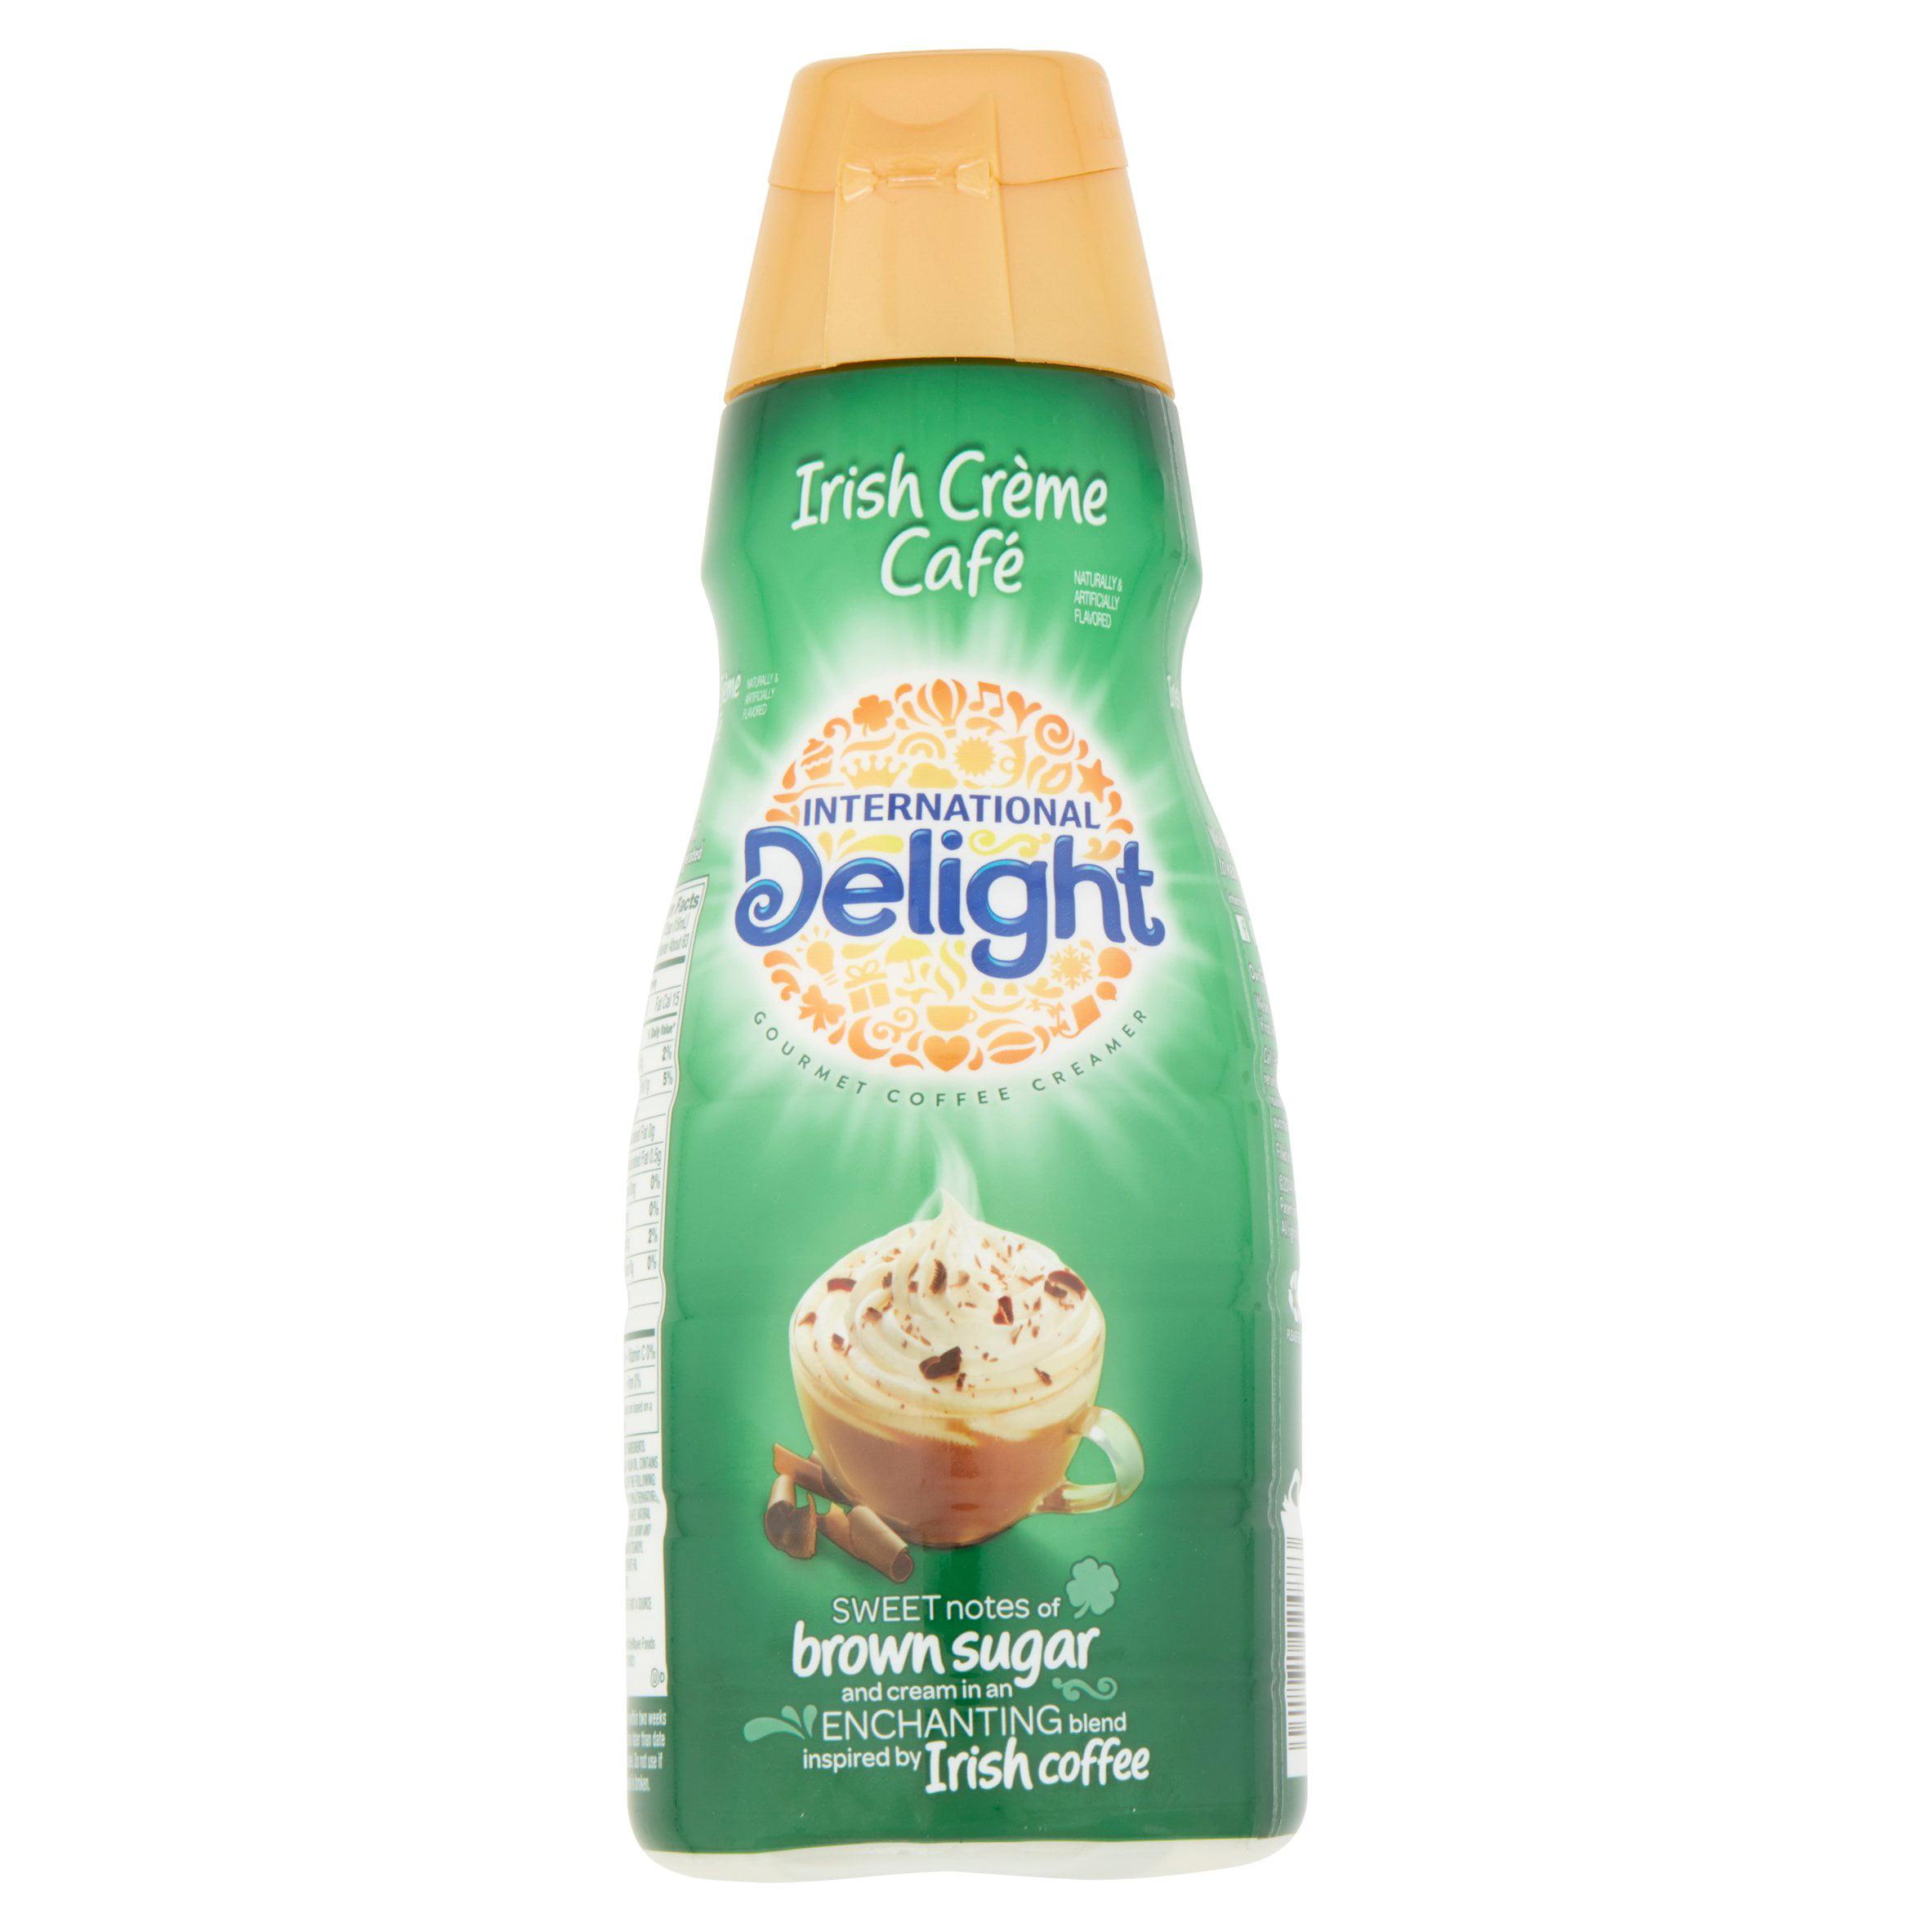 International Delight, Irish Creme Coffee Creamer, 32 Oz.   Walmart.com